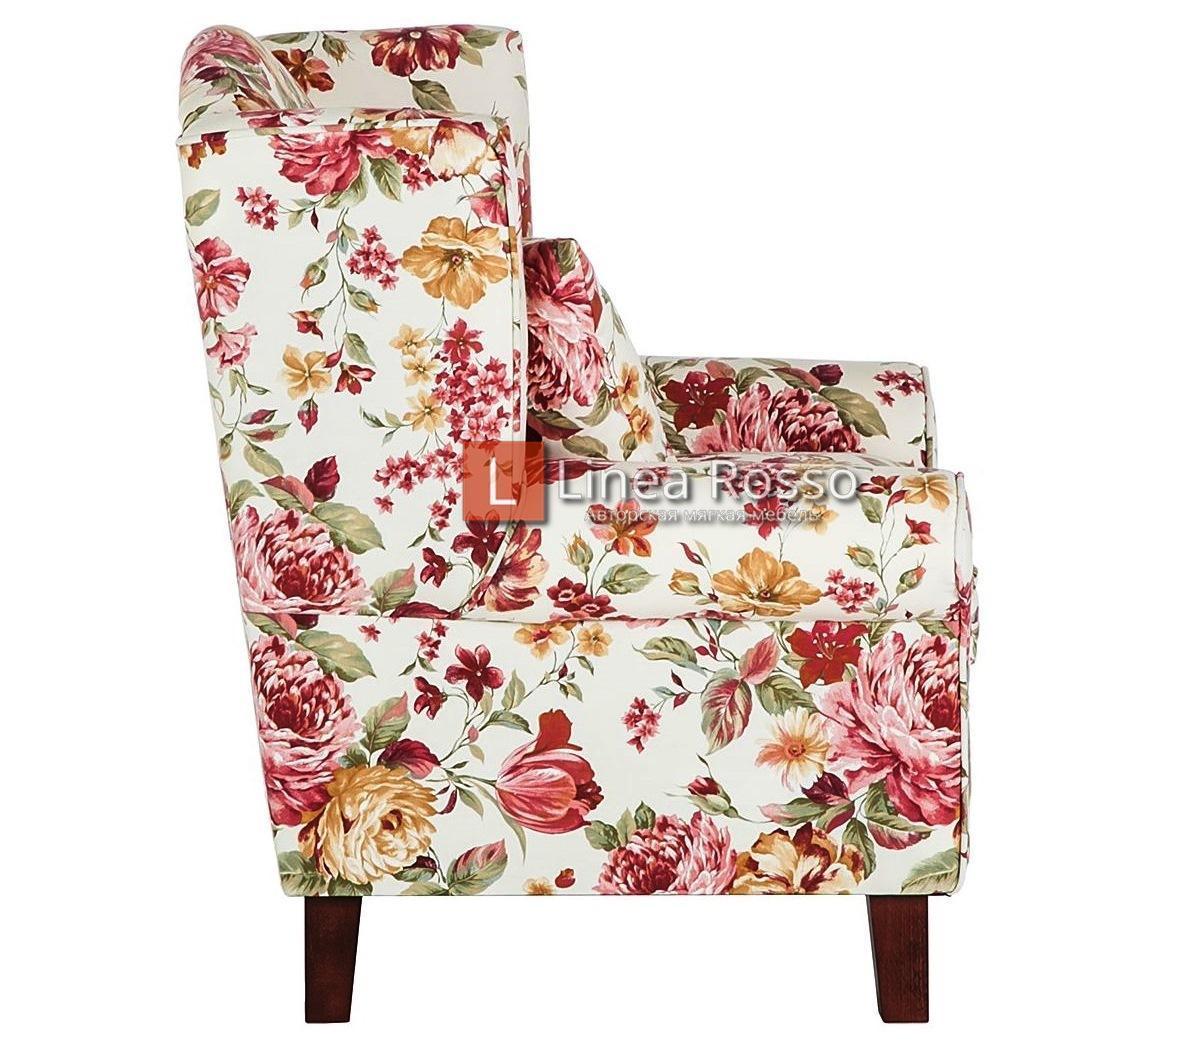 kreslo v tsvetochnyj print5 - Кресло с цветочным принтом на заказ